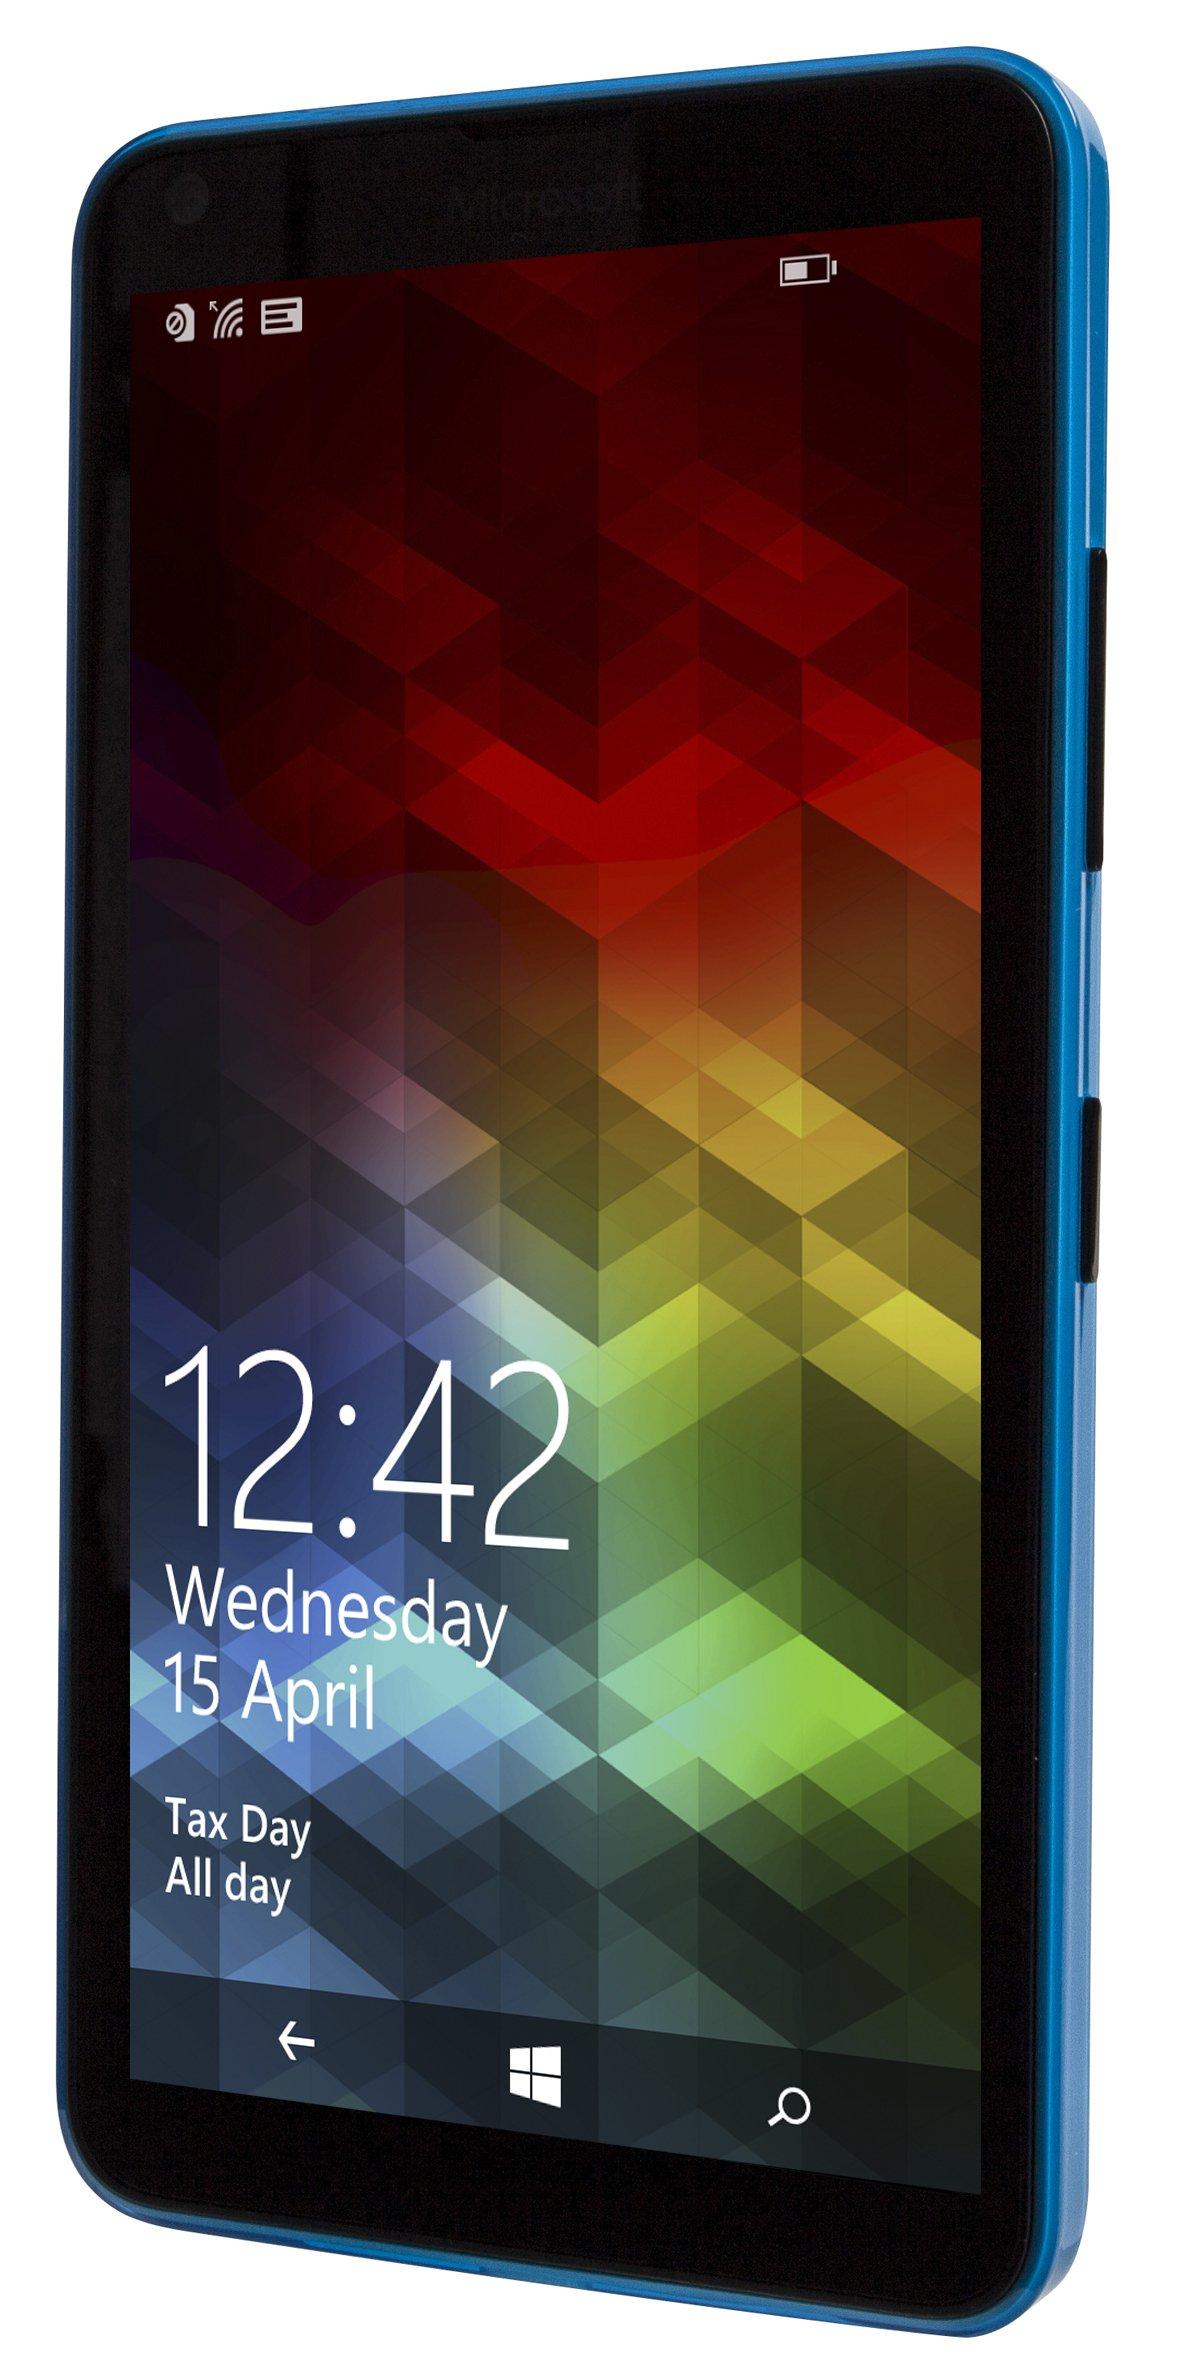 Microsoft lumia 535 dual sim white quad core 1 2ghz unlocked cell - Microsoft Lumia 640 3 4s